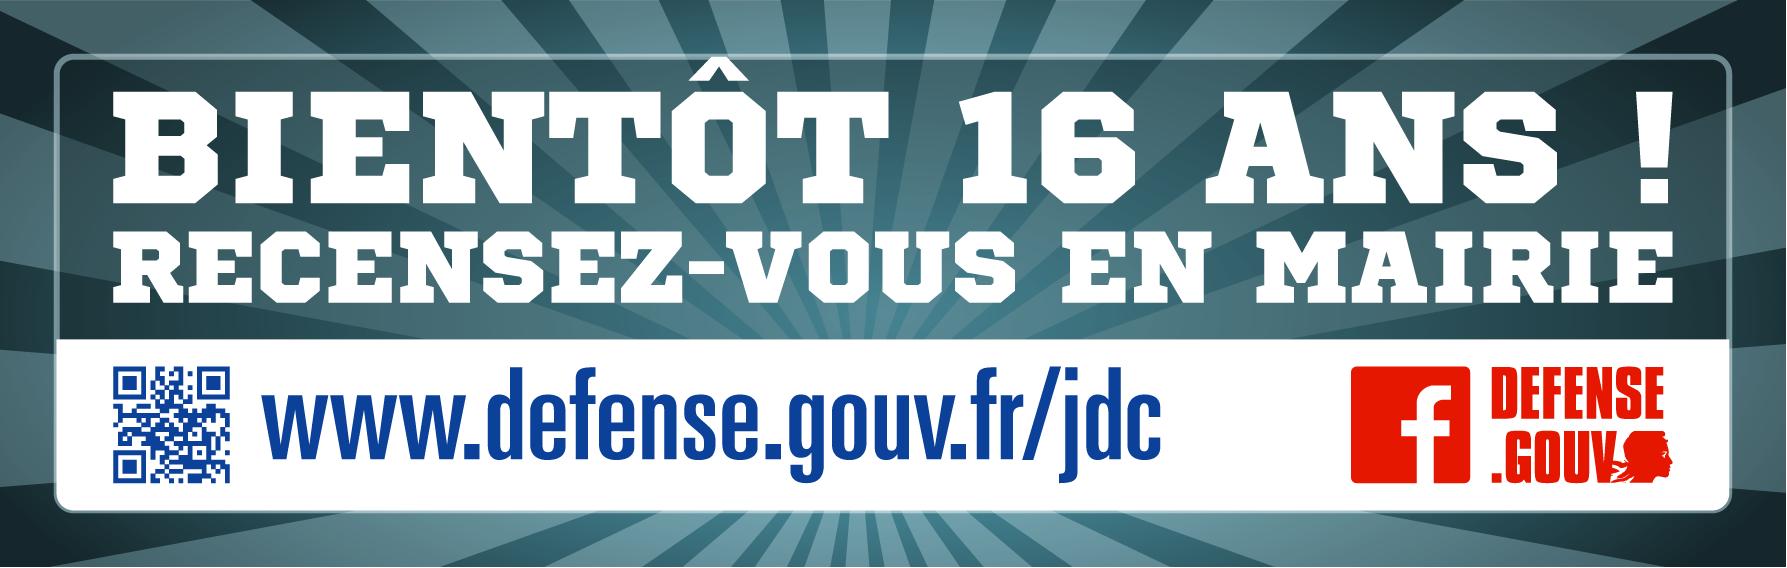 JDC - Journée Défense & Citoyenneté !